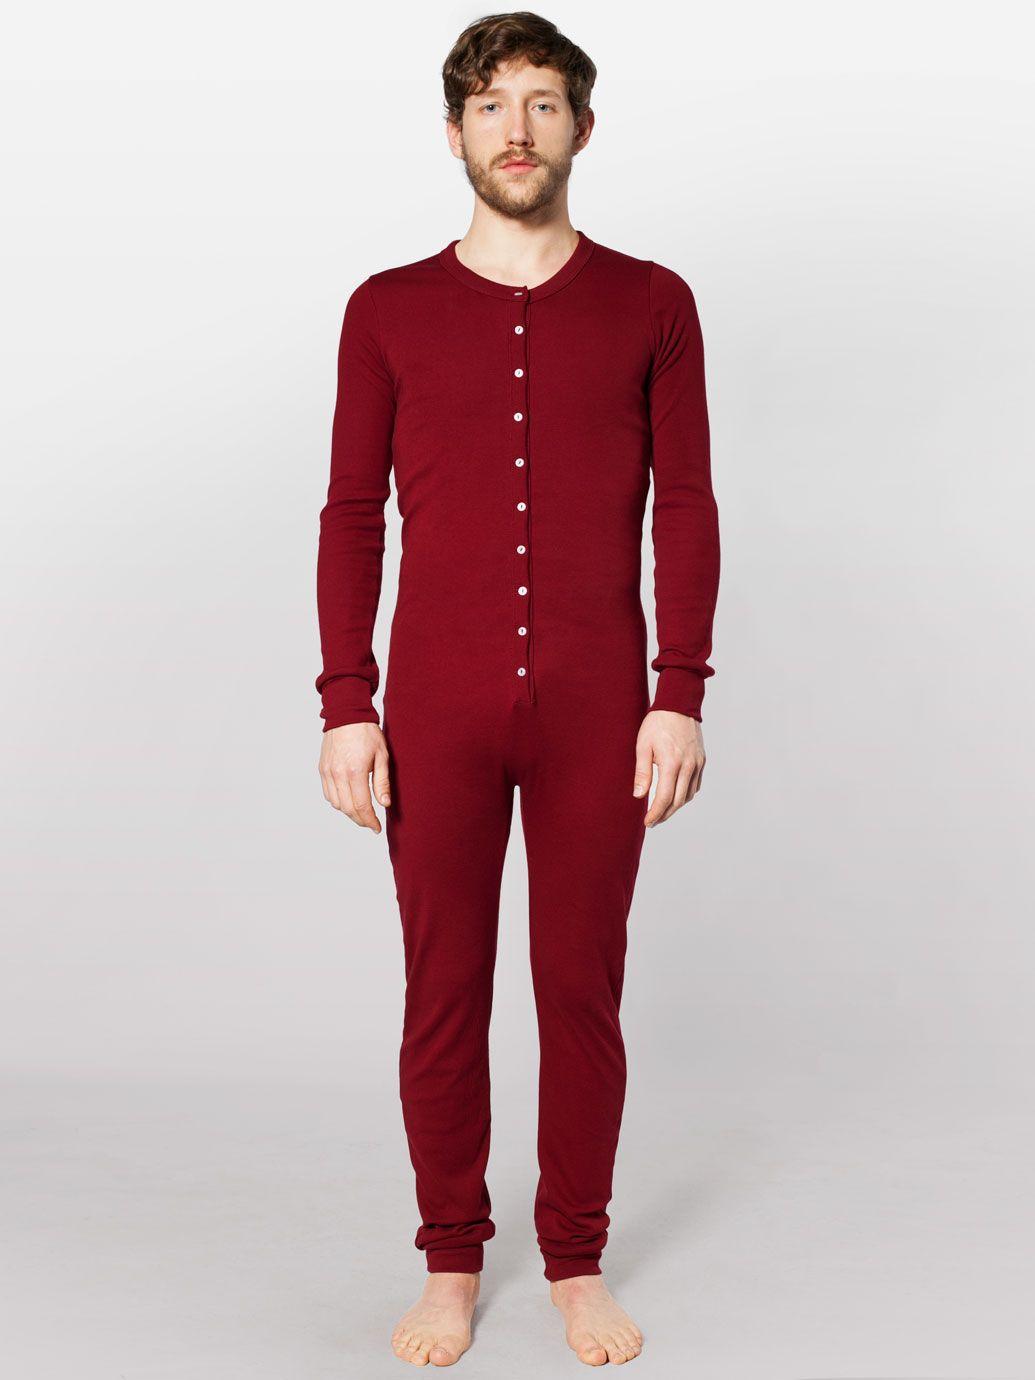 Mens Button Up Pajamas Breeze Clothing